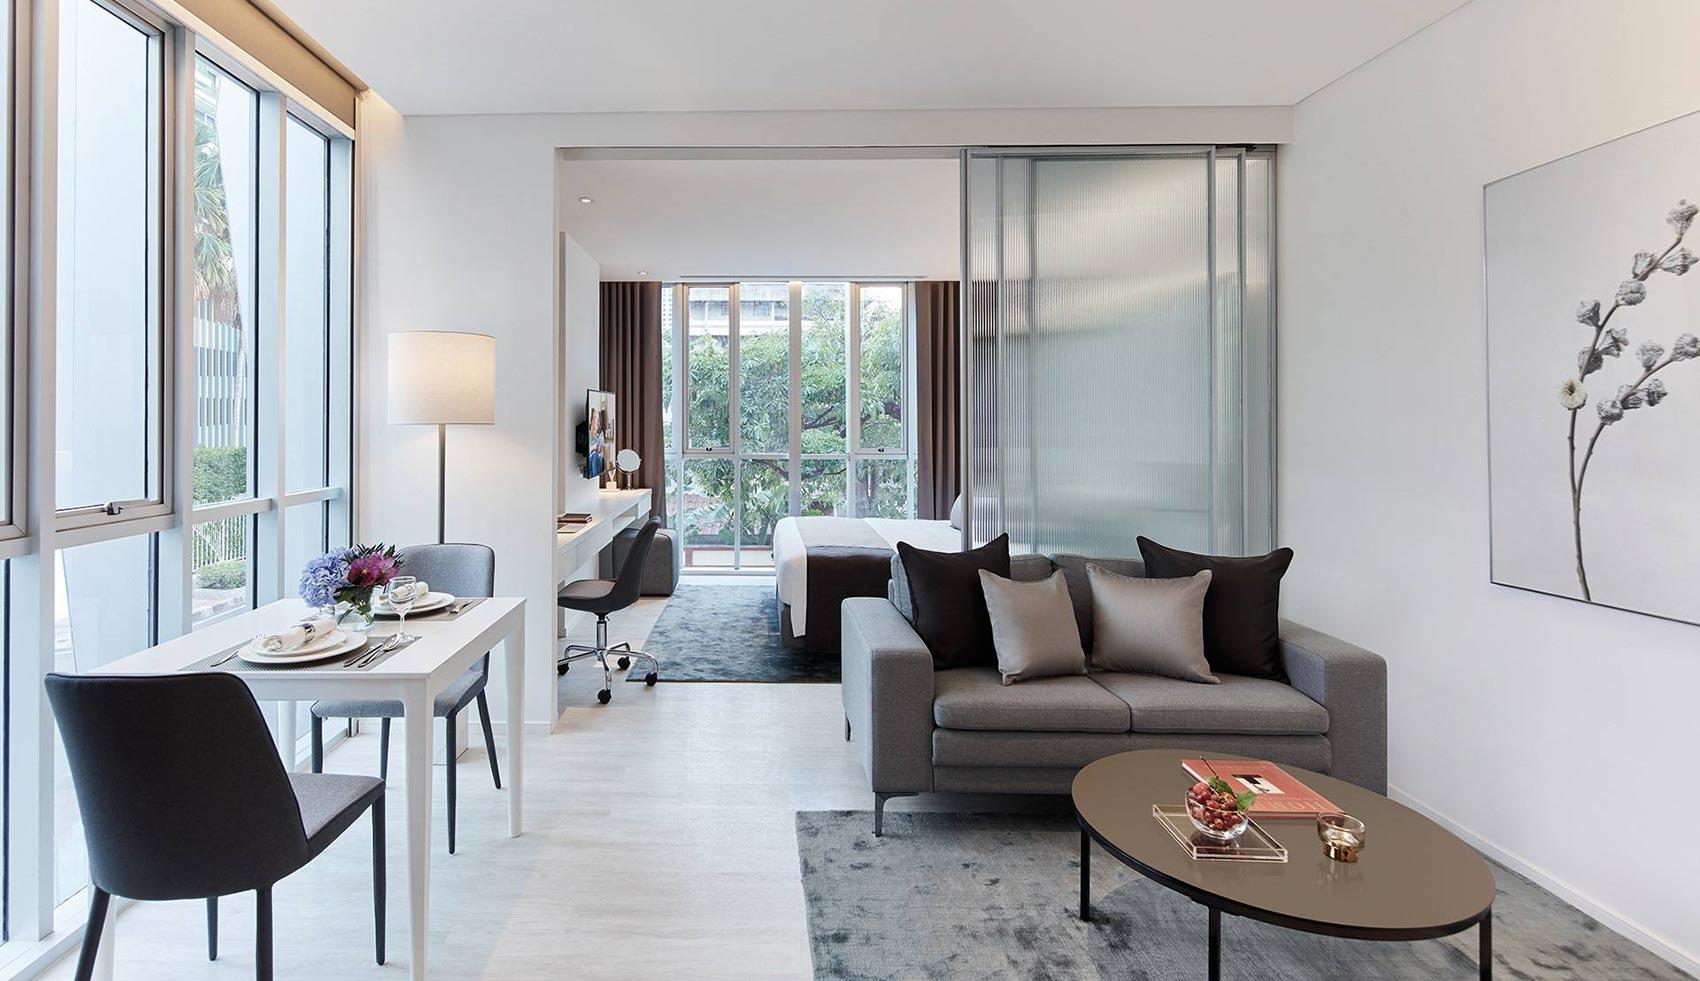 Somerset Maison Asoke 1 bedroom executive apartment